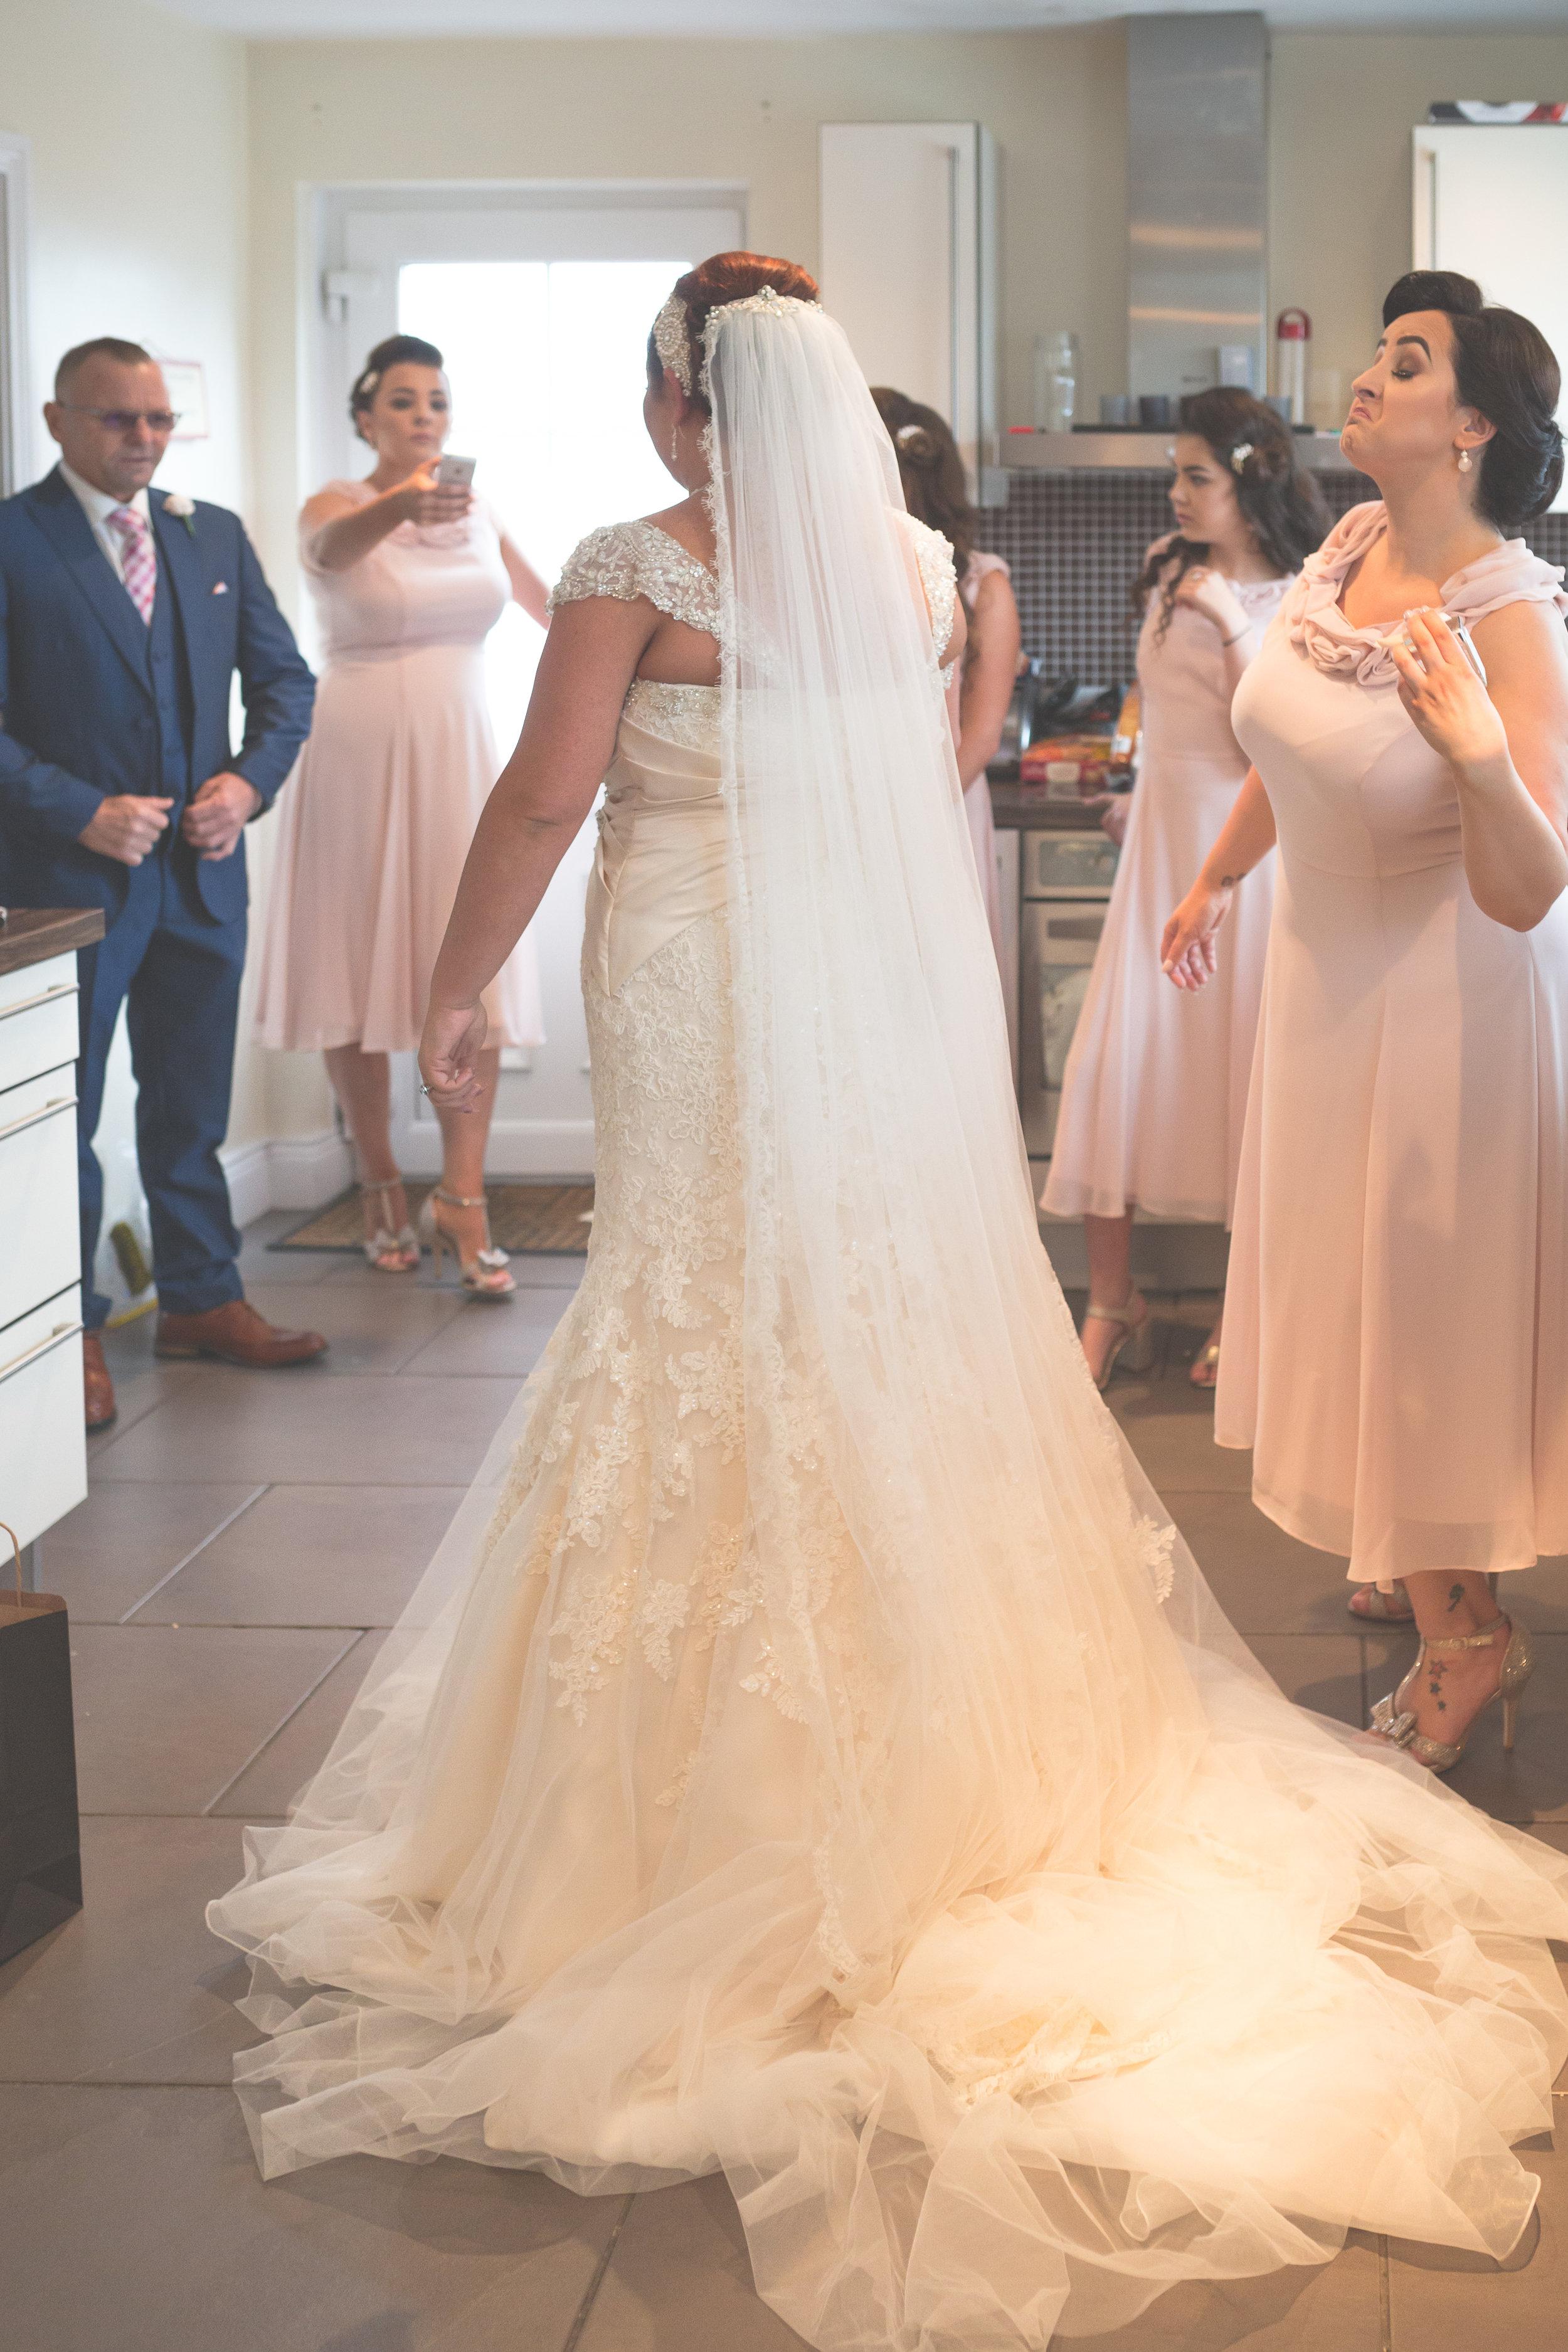 Antoinette & Stephen - Bridal Preparations | Brian McEwan Photography | Wedding Photographer Northern Ireland 185.jpg